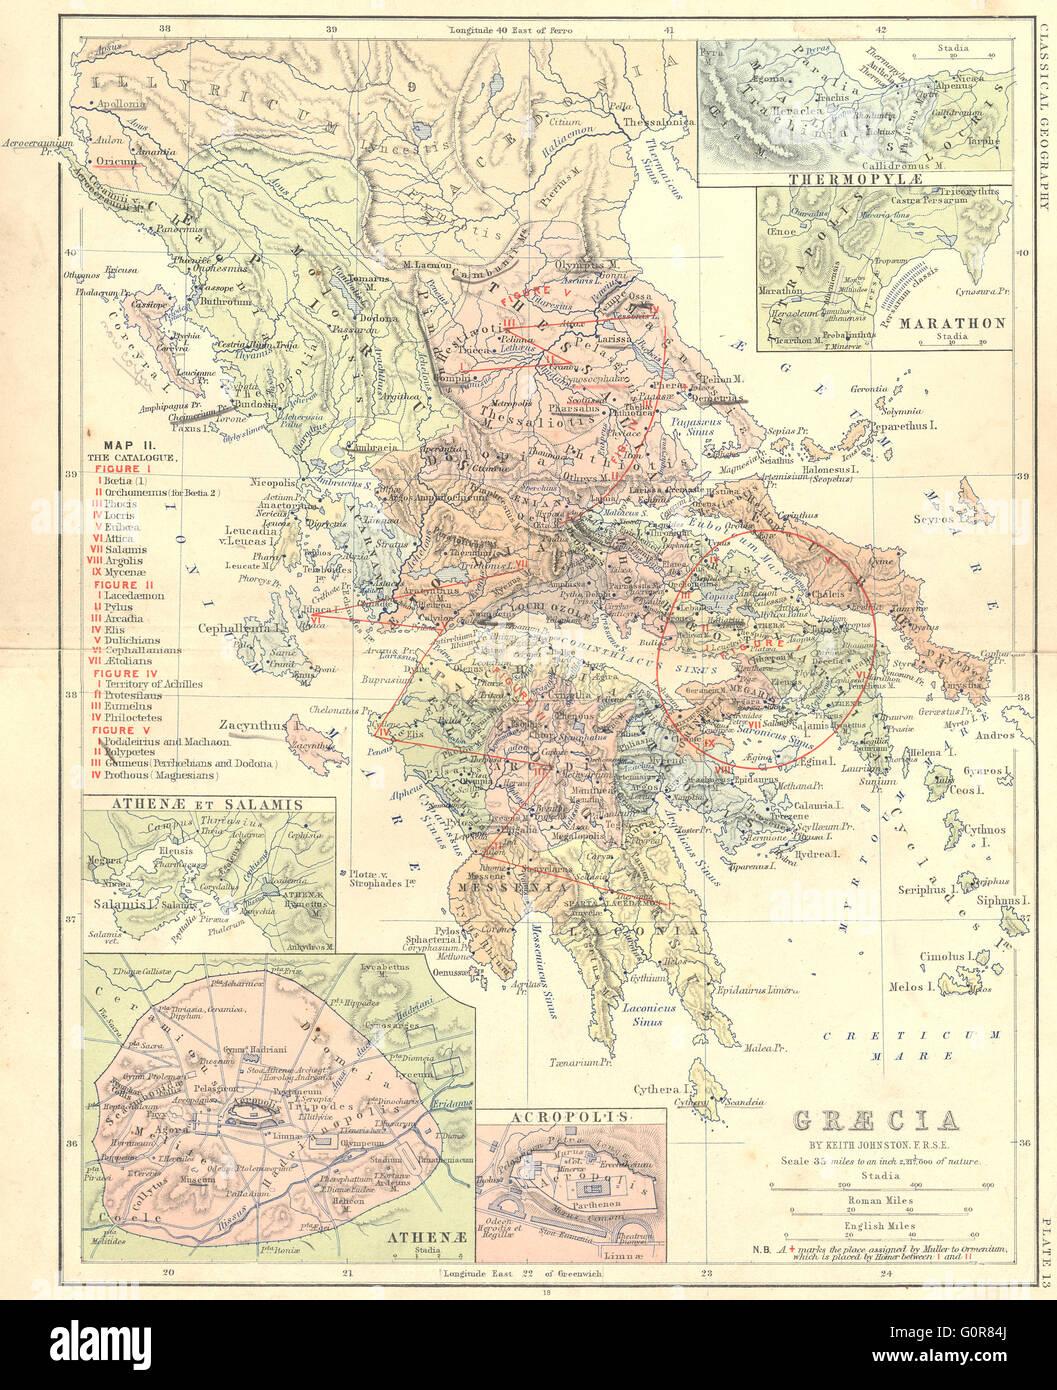 Greece Thermopylae Marathon Athens Salamis 1880 Antique Map